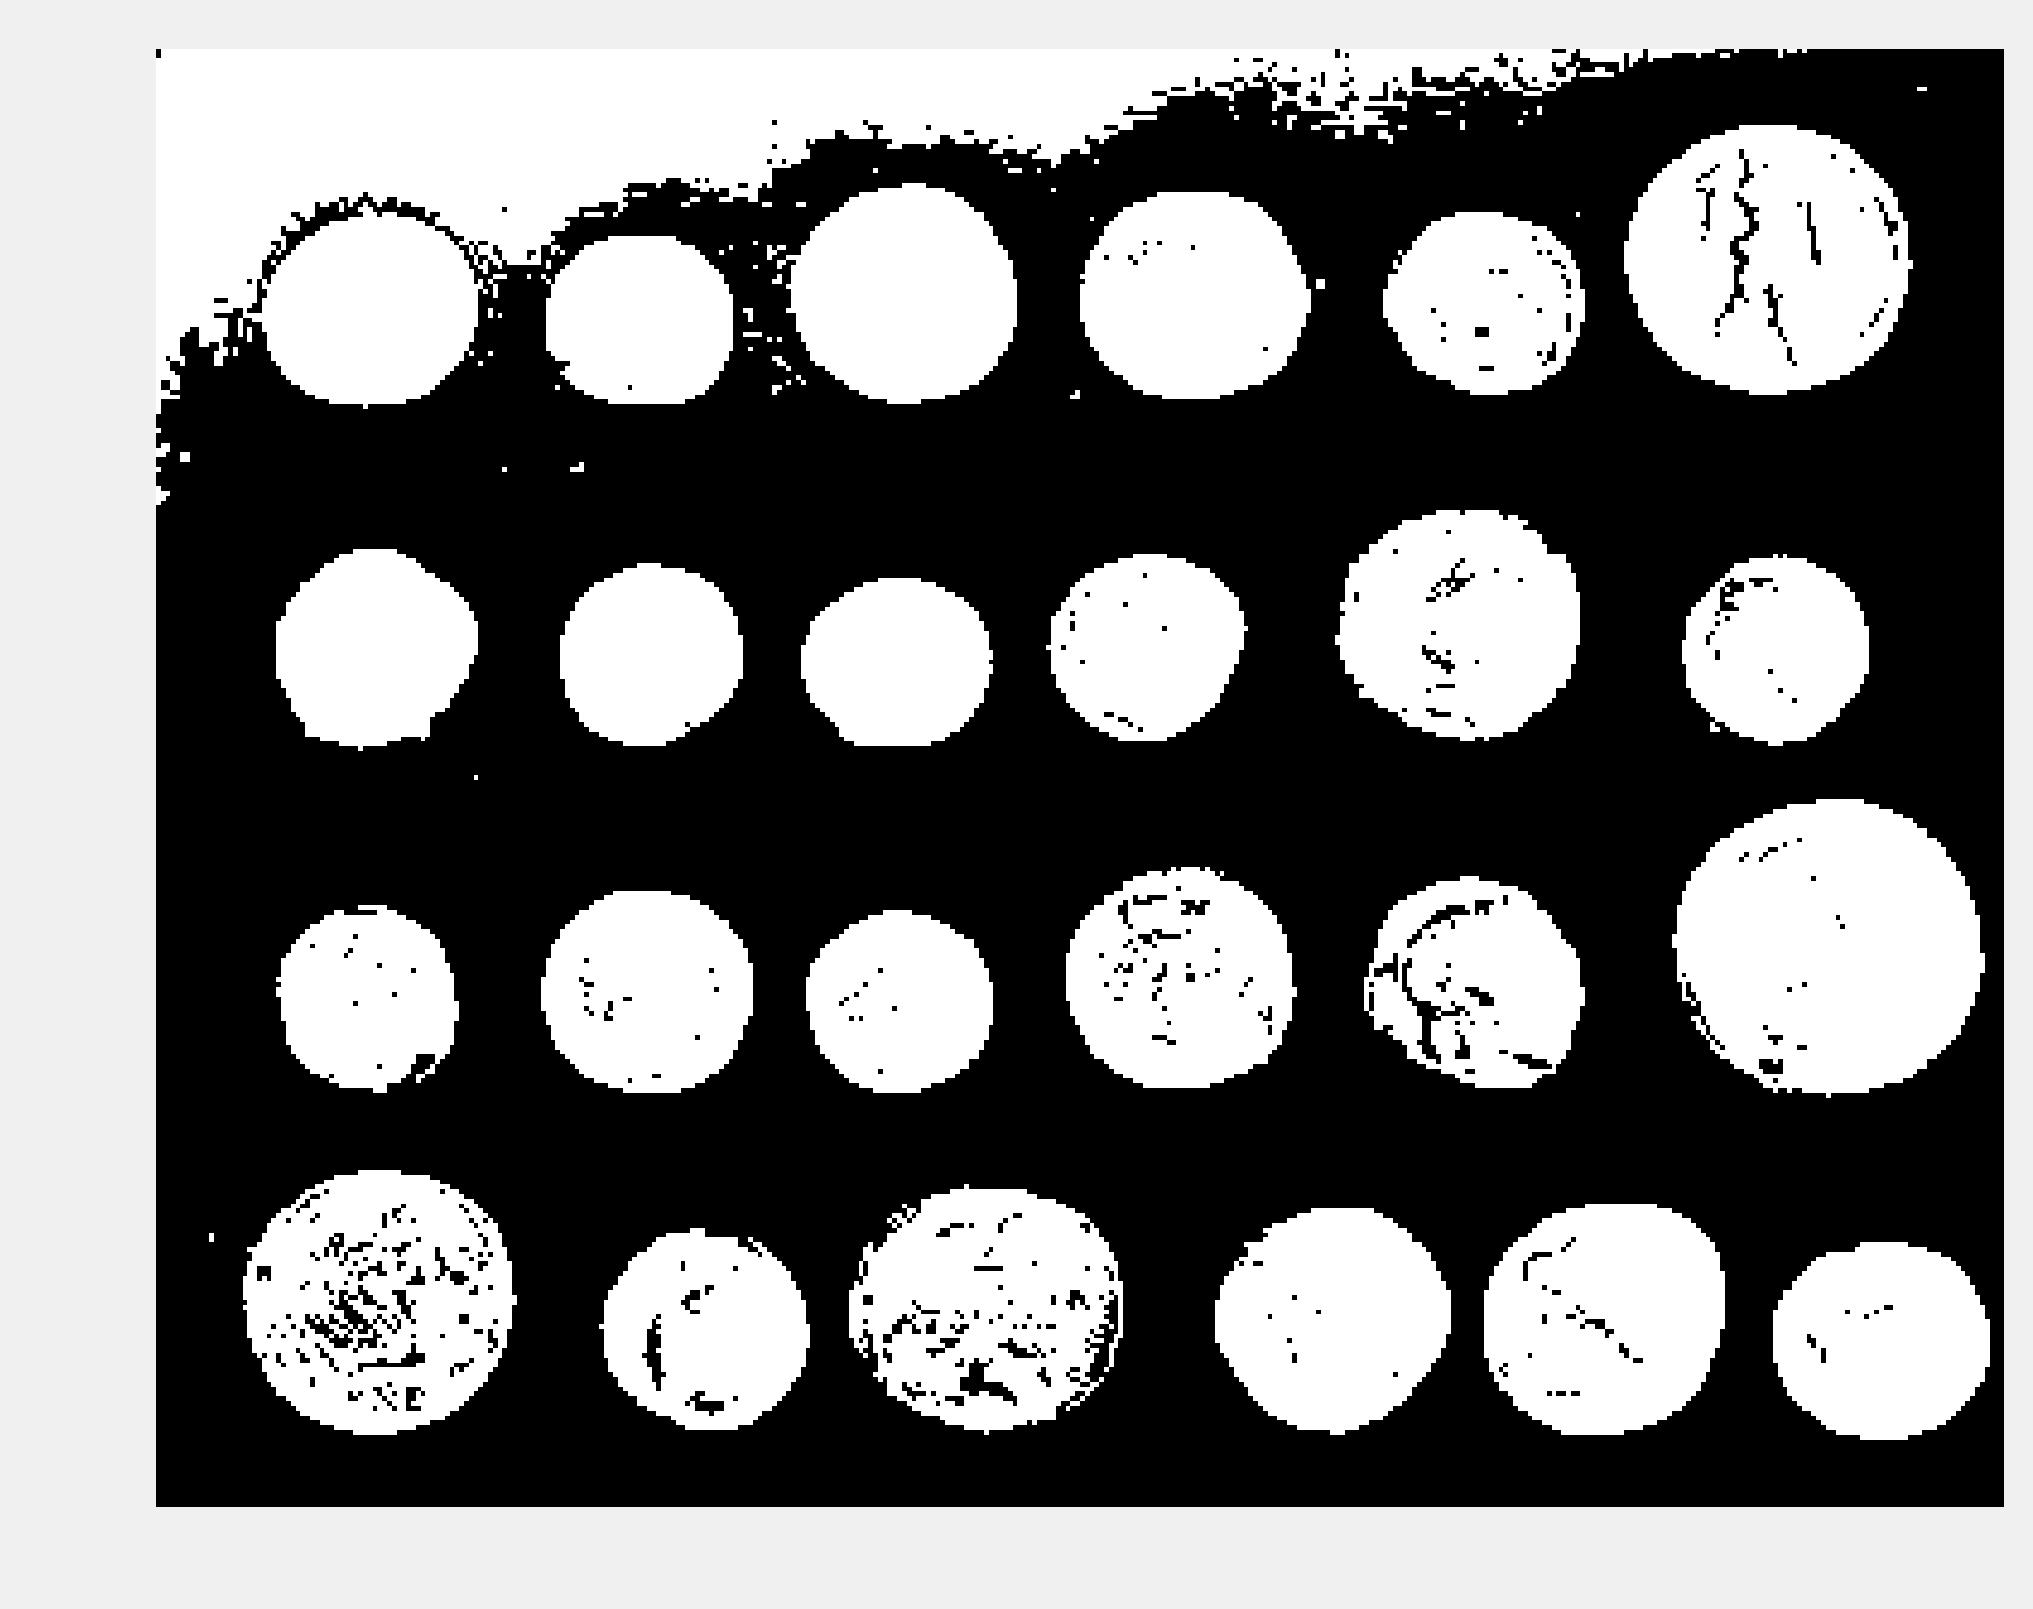 <matplotlib.figure.Figure at 0x7a03630>